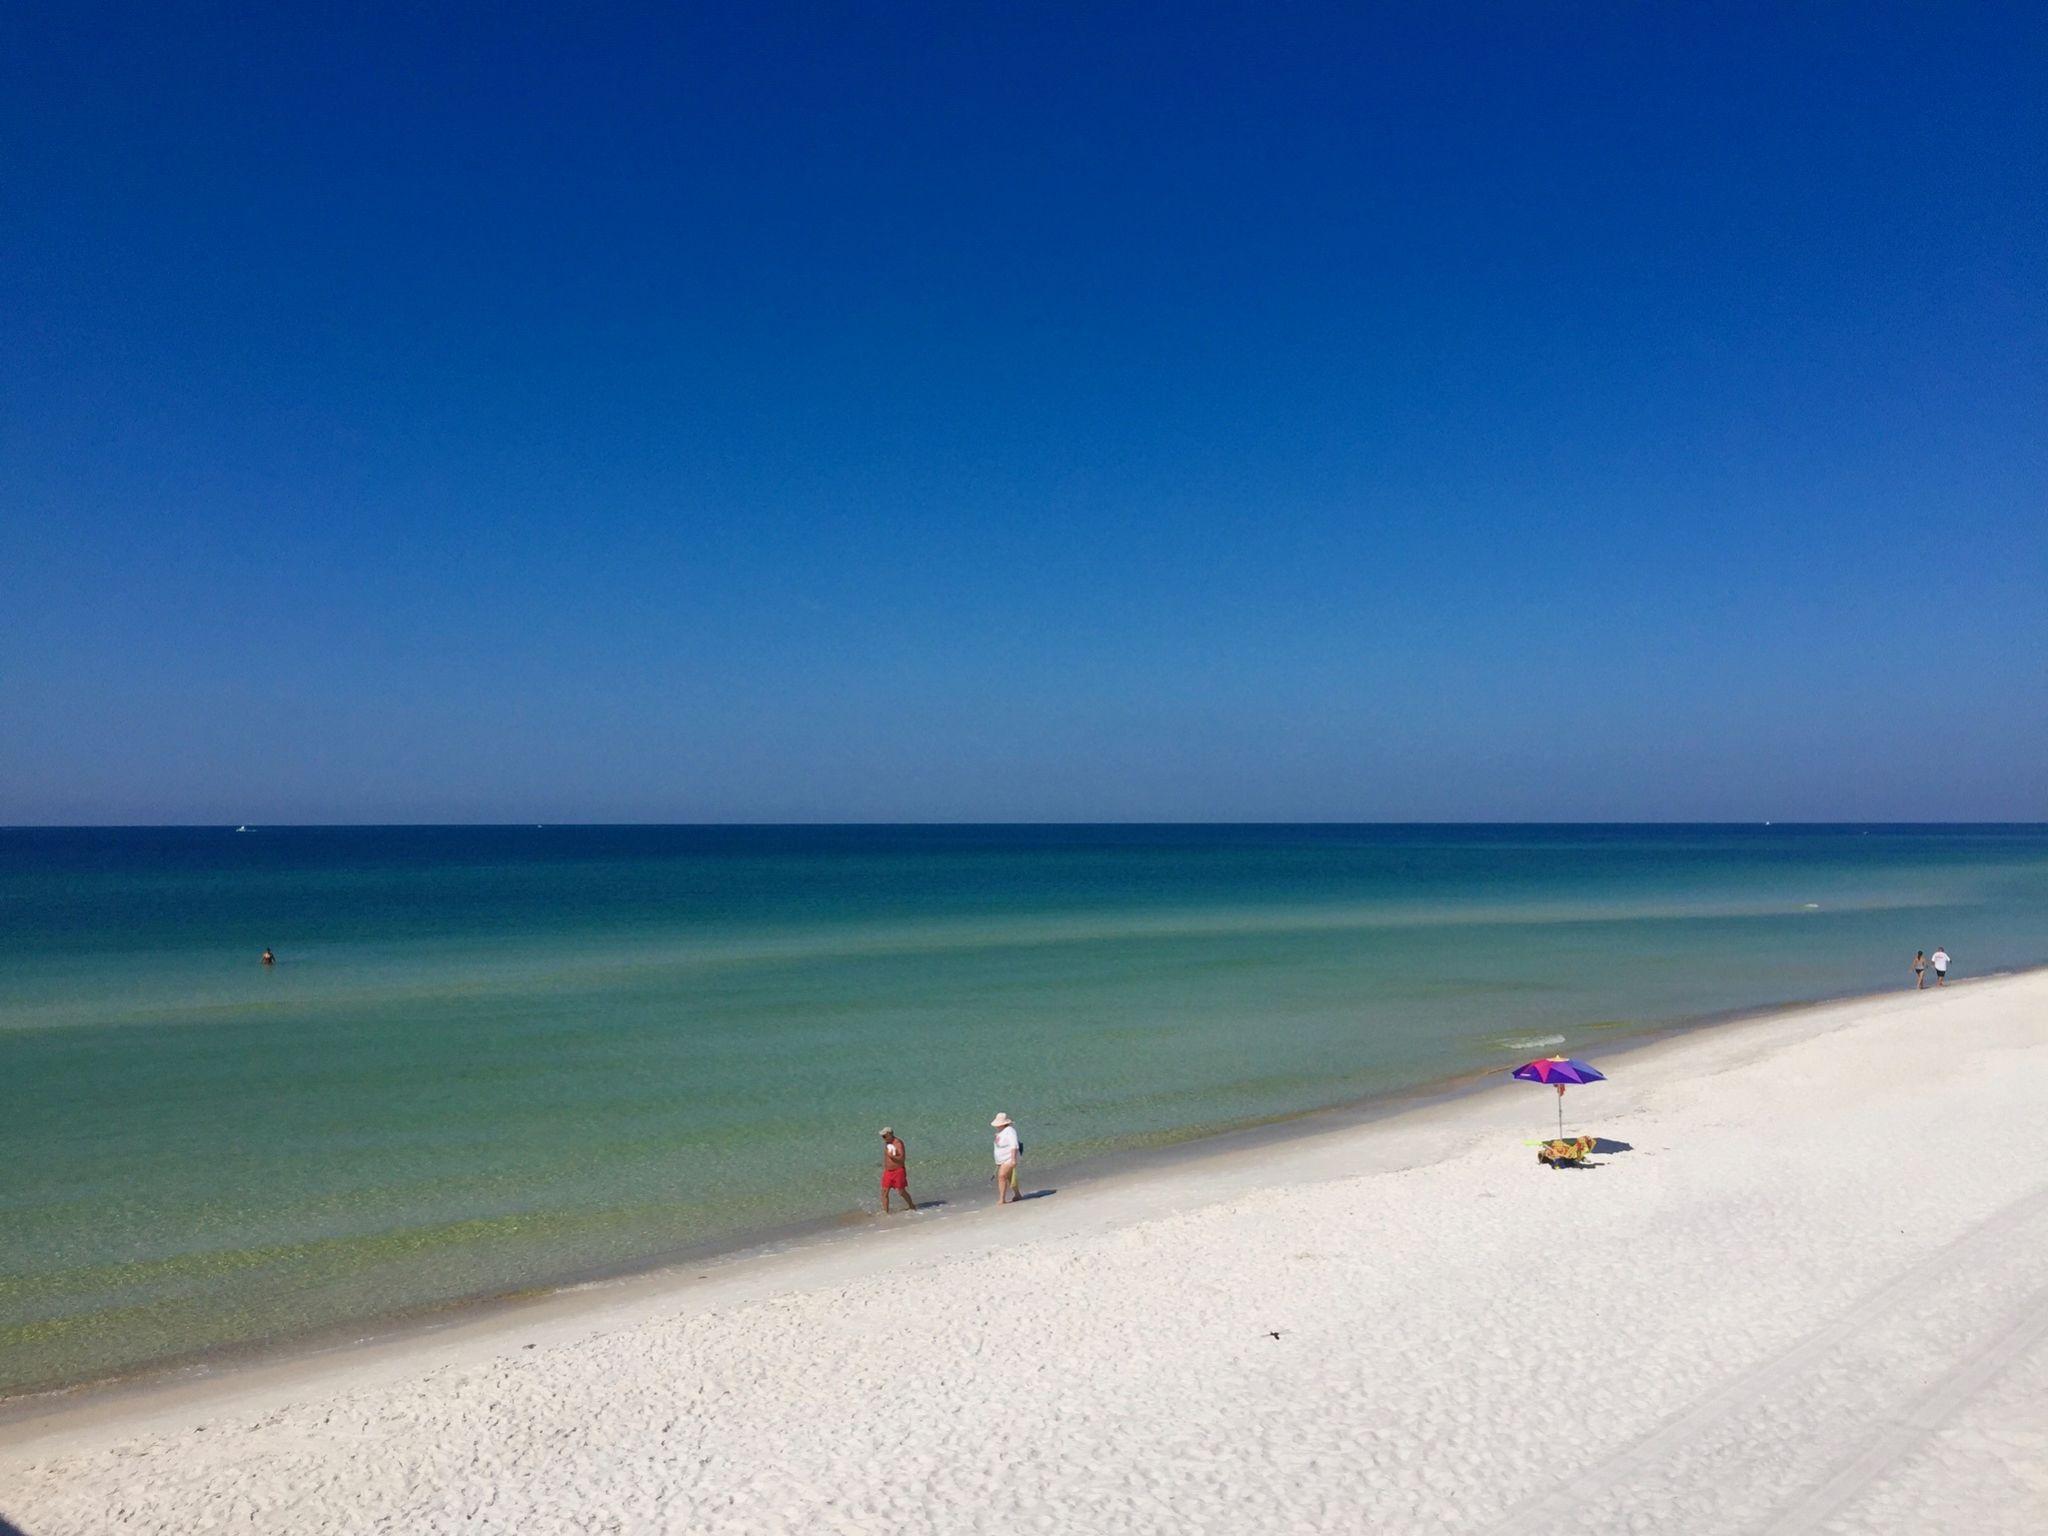 Panama City Beach in Florida